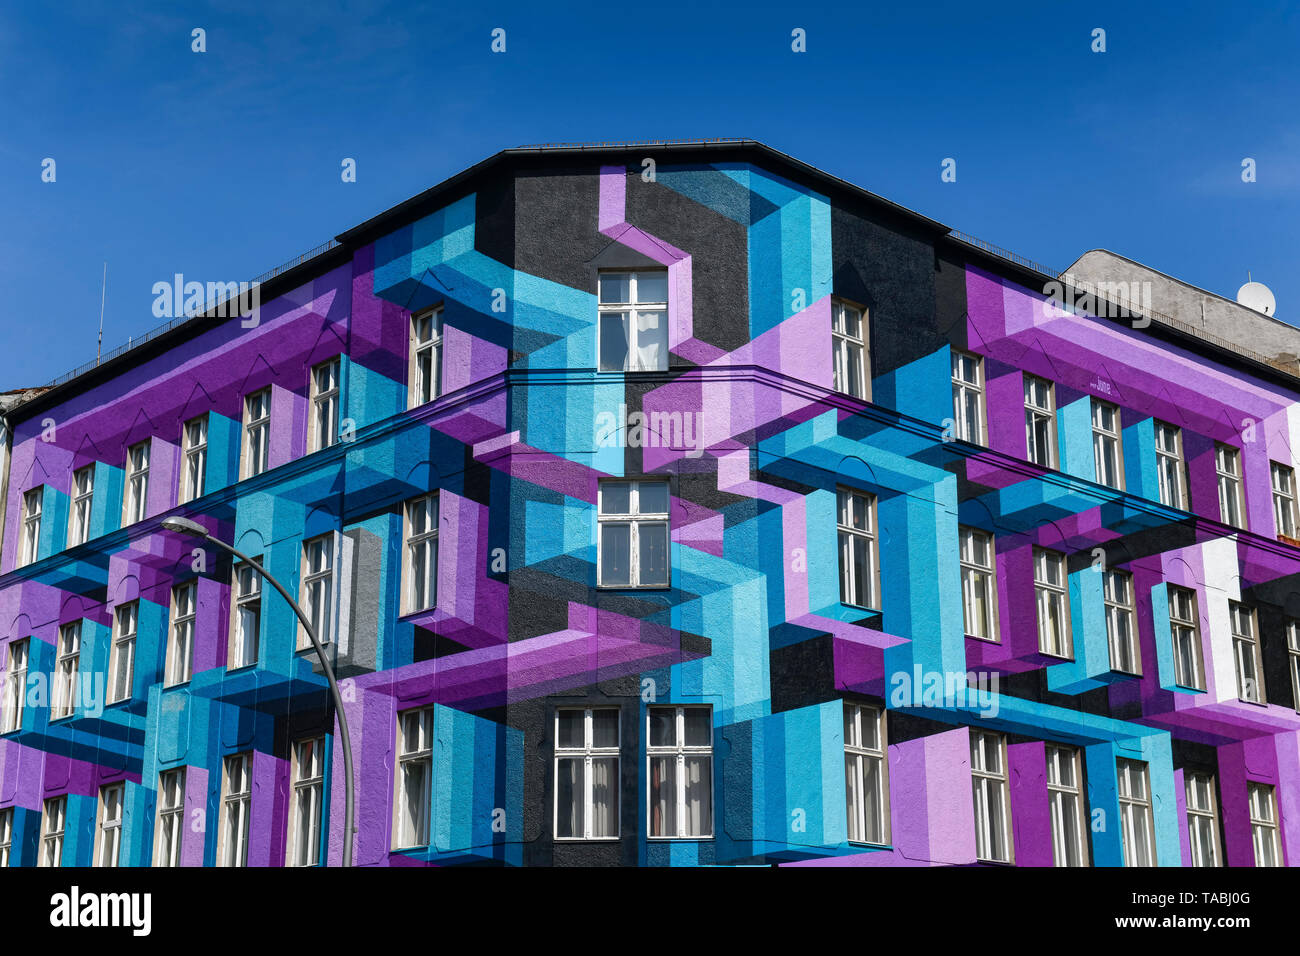 Colourfully painted house, Bülowstrasse, beauty's mountain, Berlin, Germany, Farbig bemaltes Haus, Bülowstraße, Schoeneberg, Deutschland - Stock Image